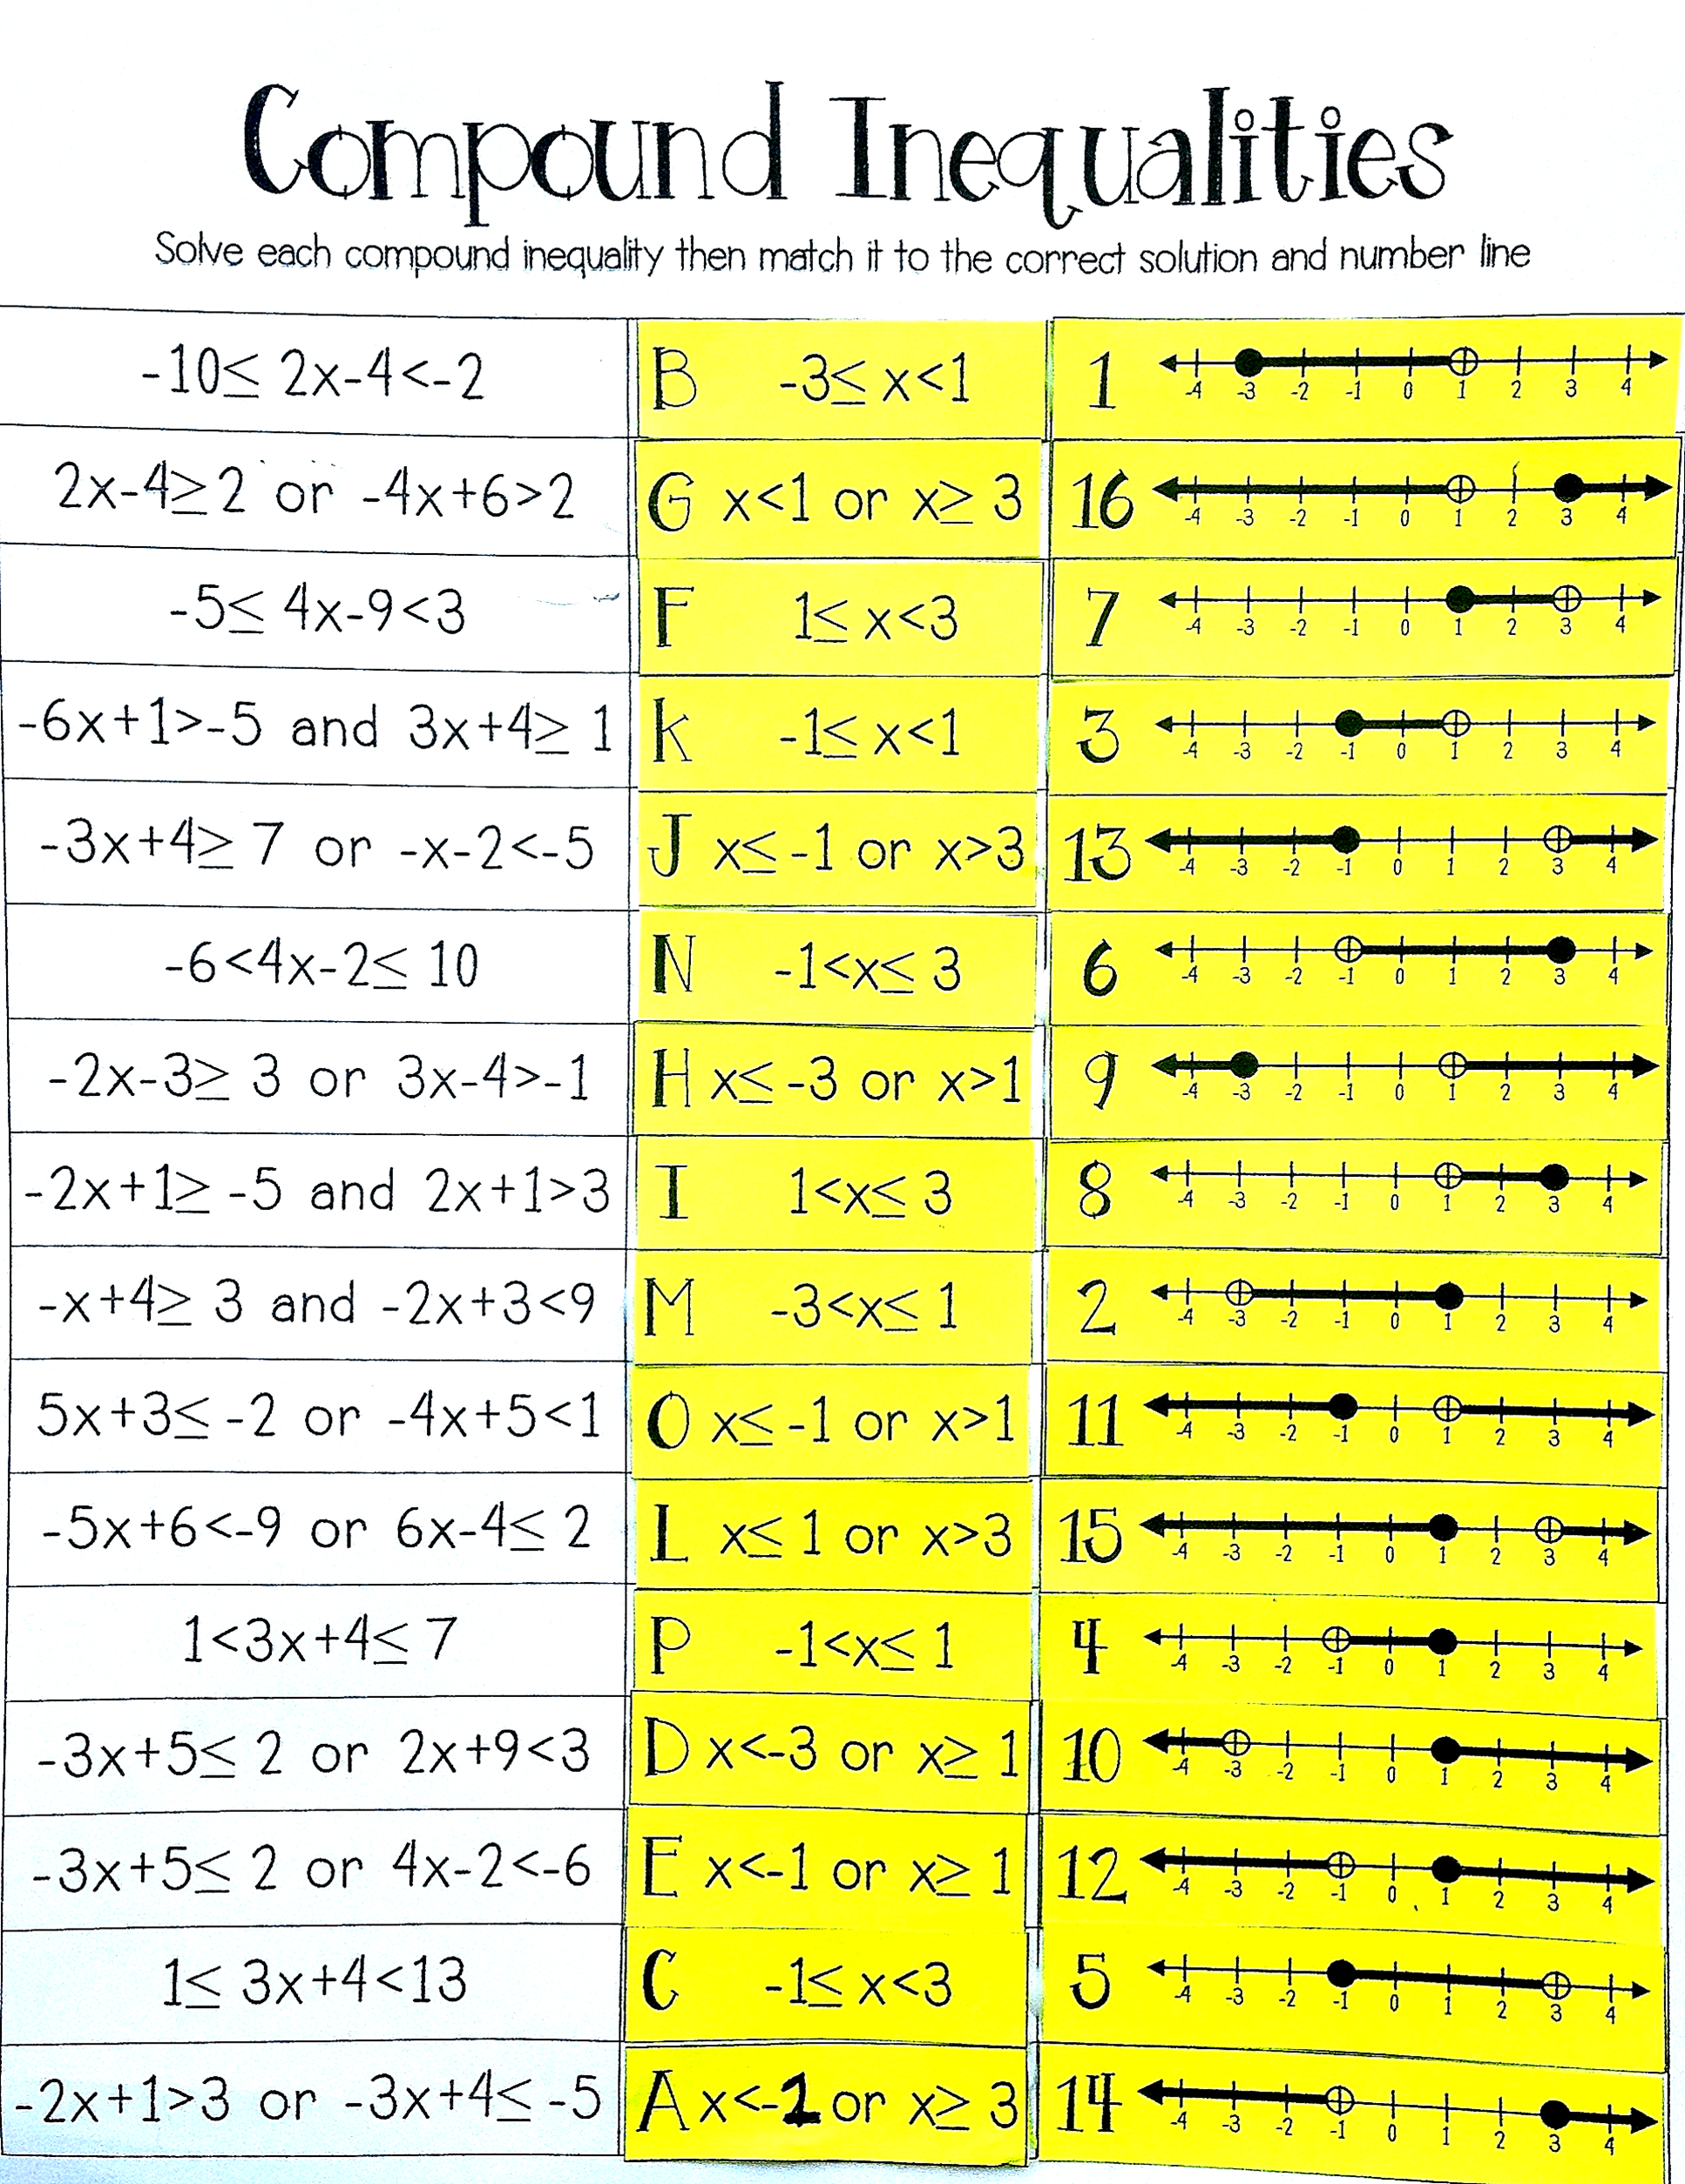 Compound Inequalities Card Match Activity - PDF \u0026 Digital   Compound  inequalities [ 2507 x 1934 Pixel ]